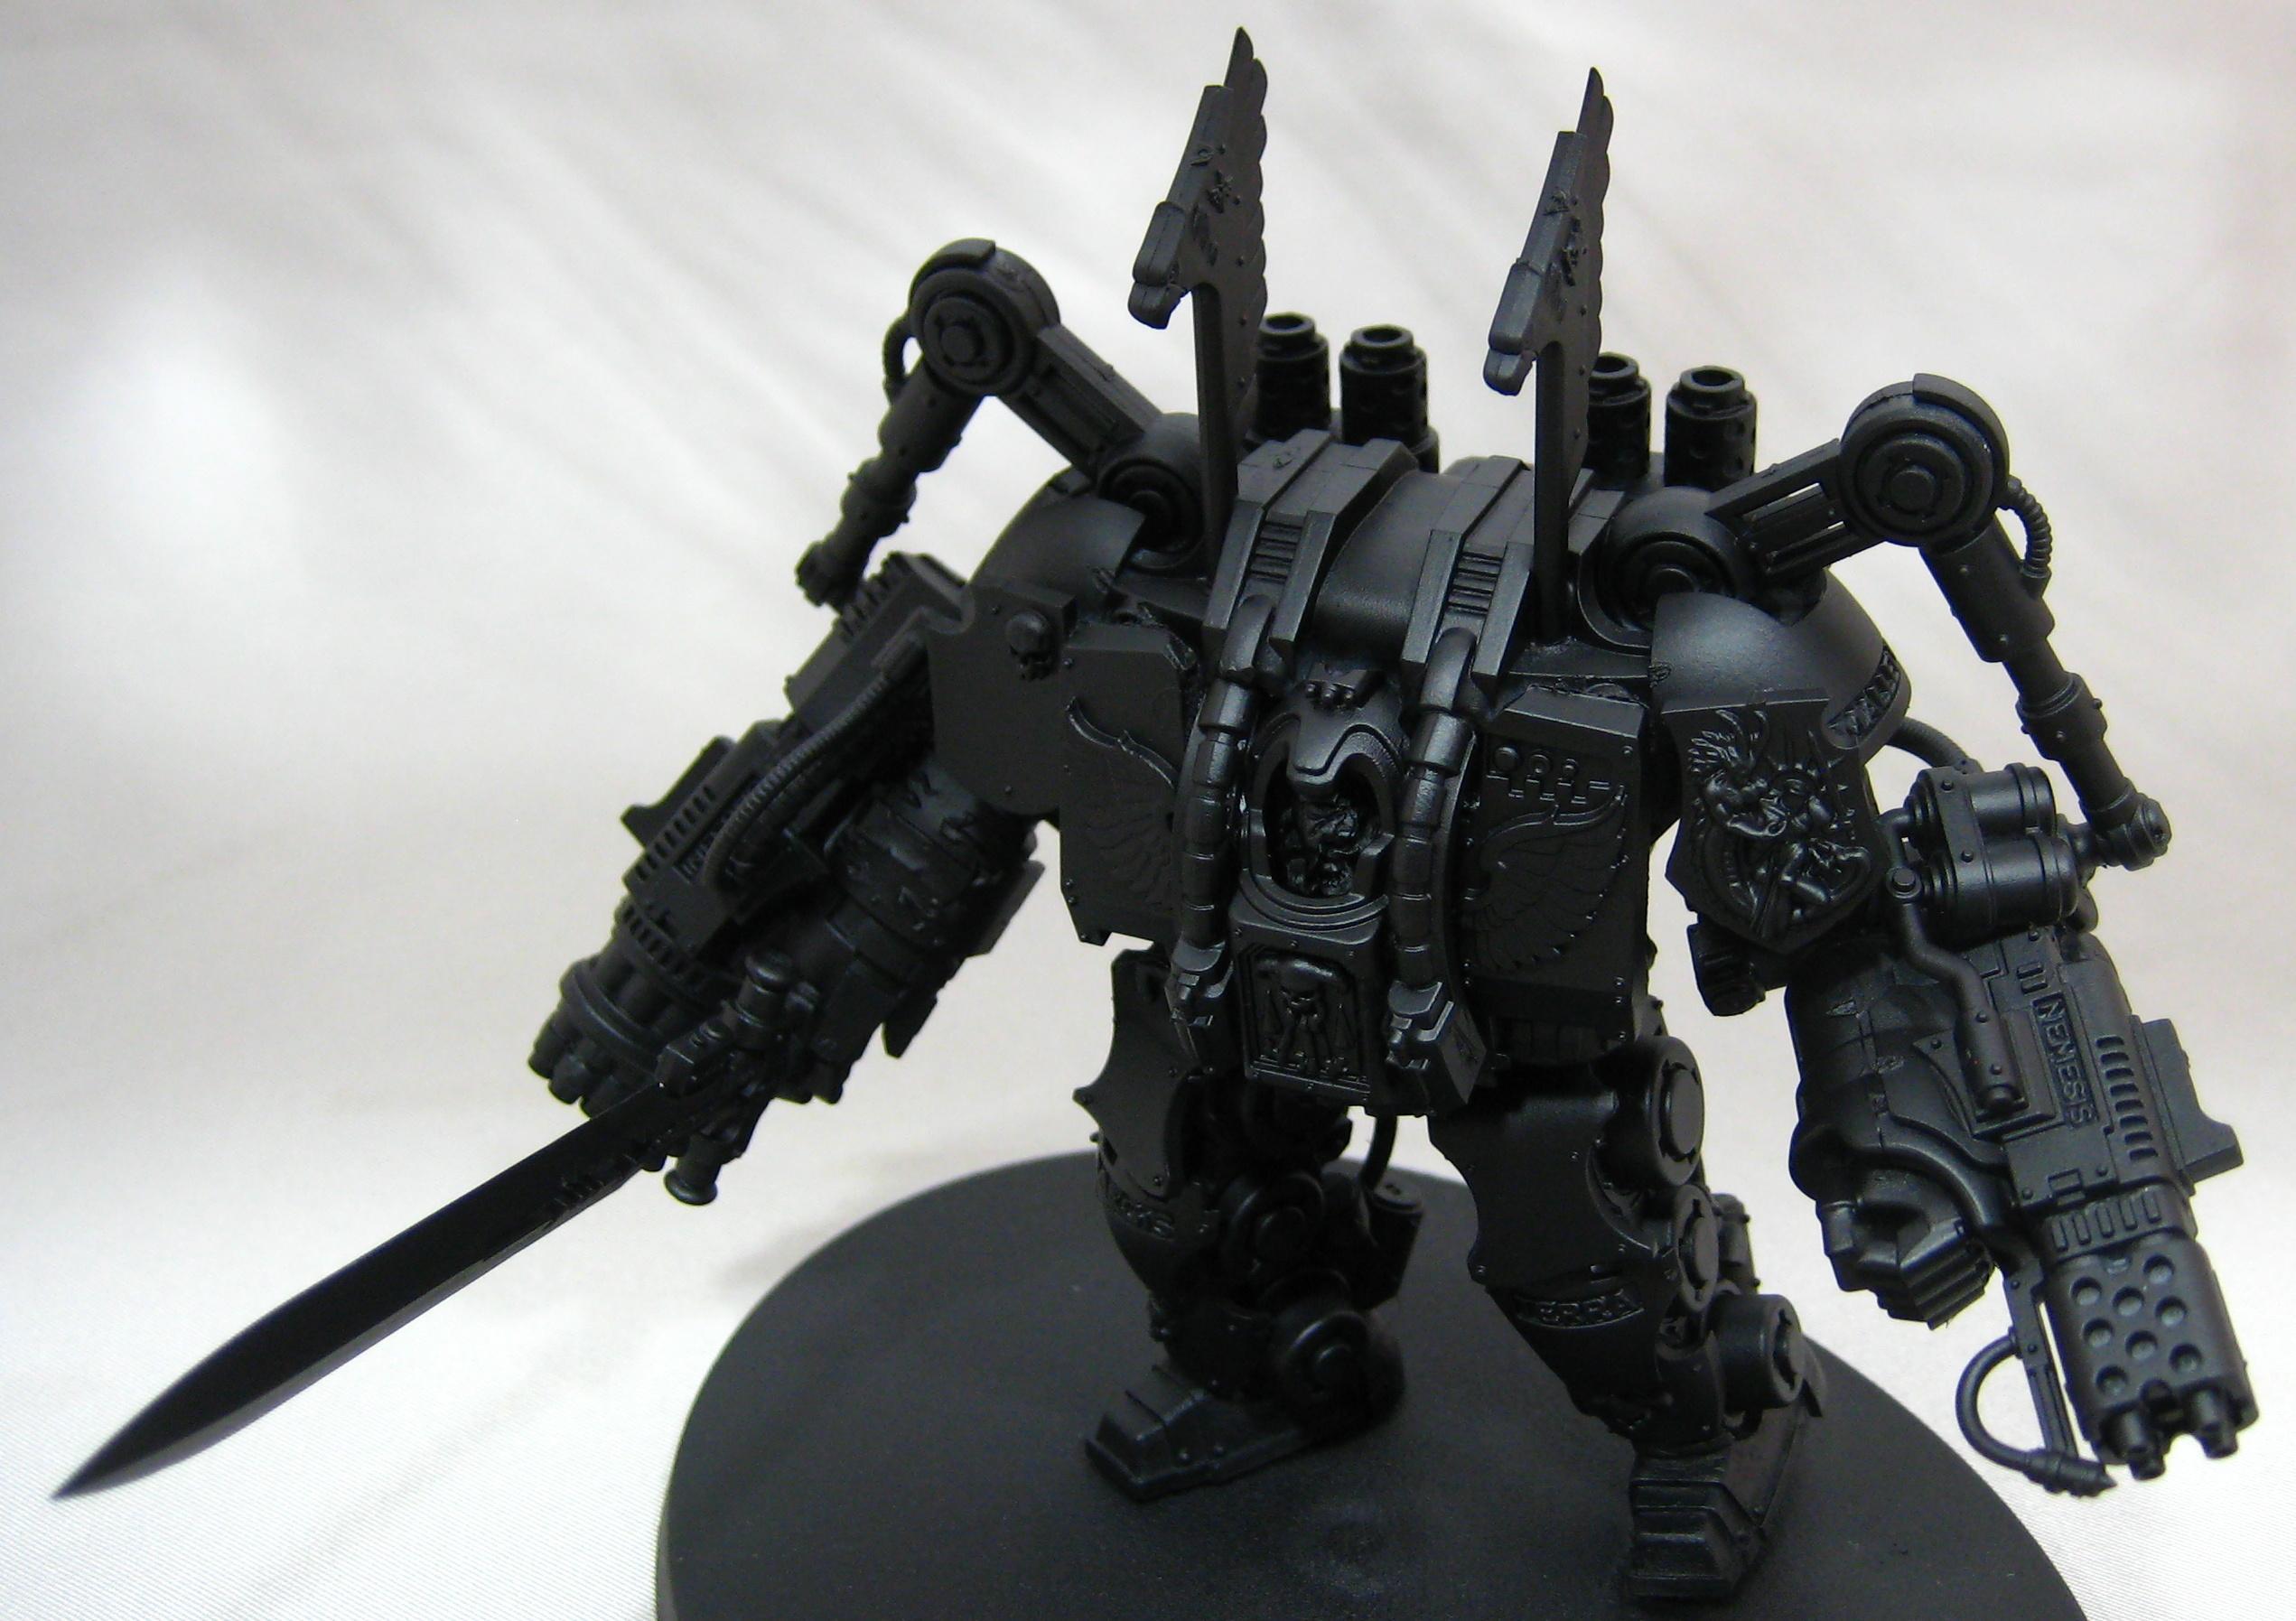 Conversion, Dreadknight, Dreadnought, Kit Bash, Librarian, Space Marines, Warhammer 40,000